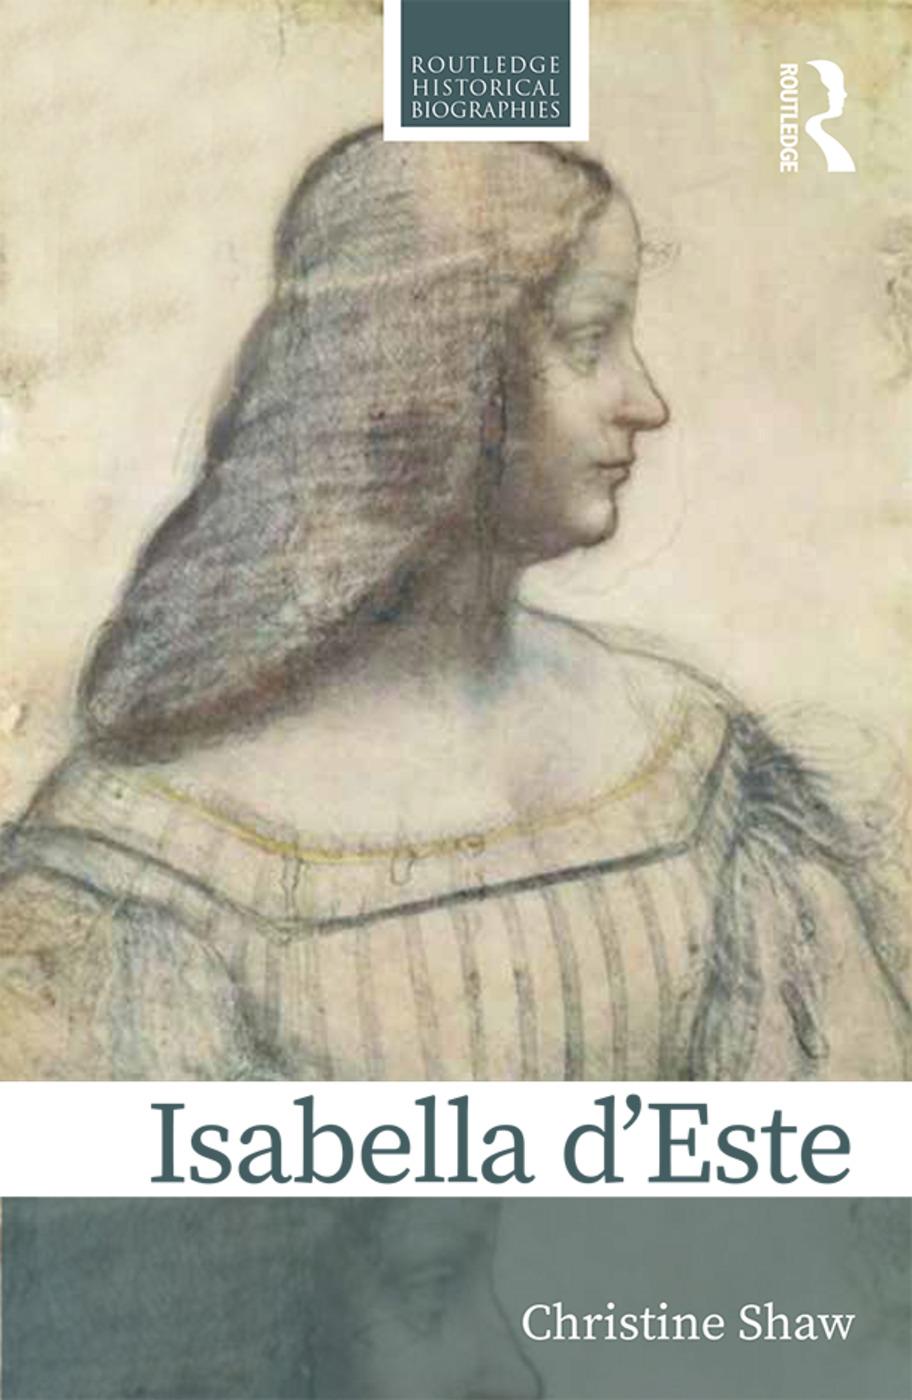 Isabella d'Este: A Renaissance Princess book cover